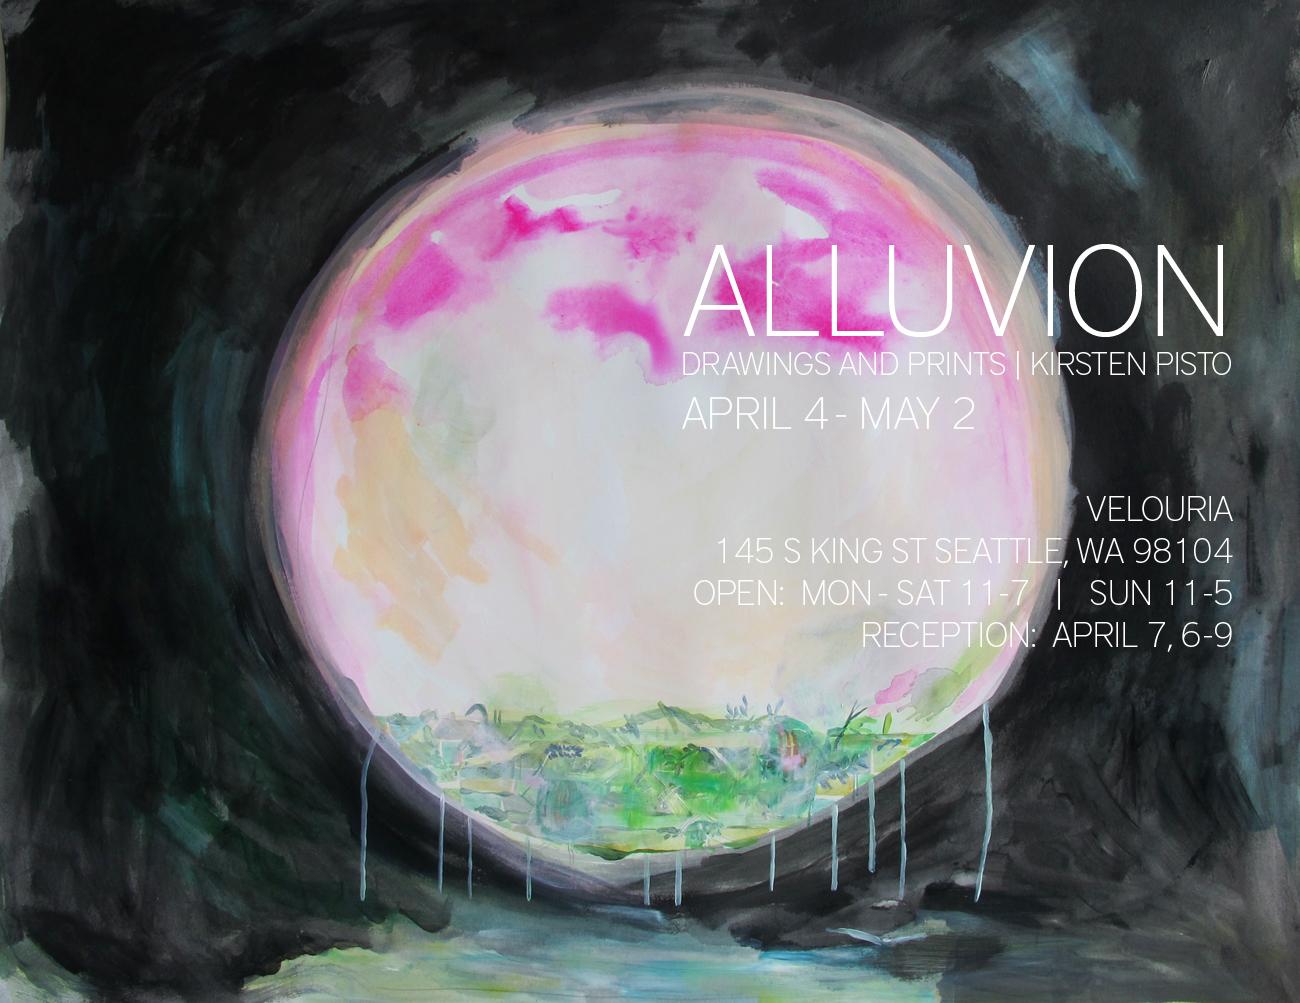 Drawings, prints and installation at  Velouria , April 4 - May 2